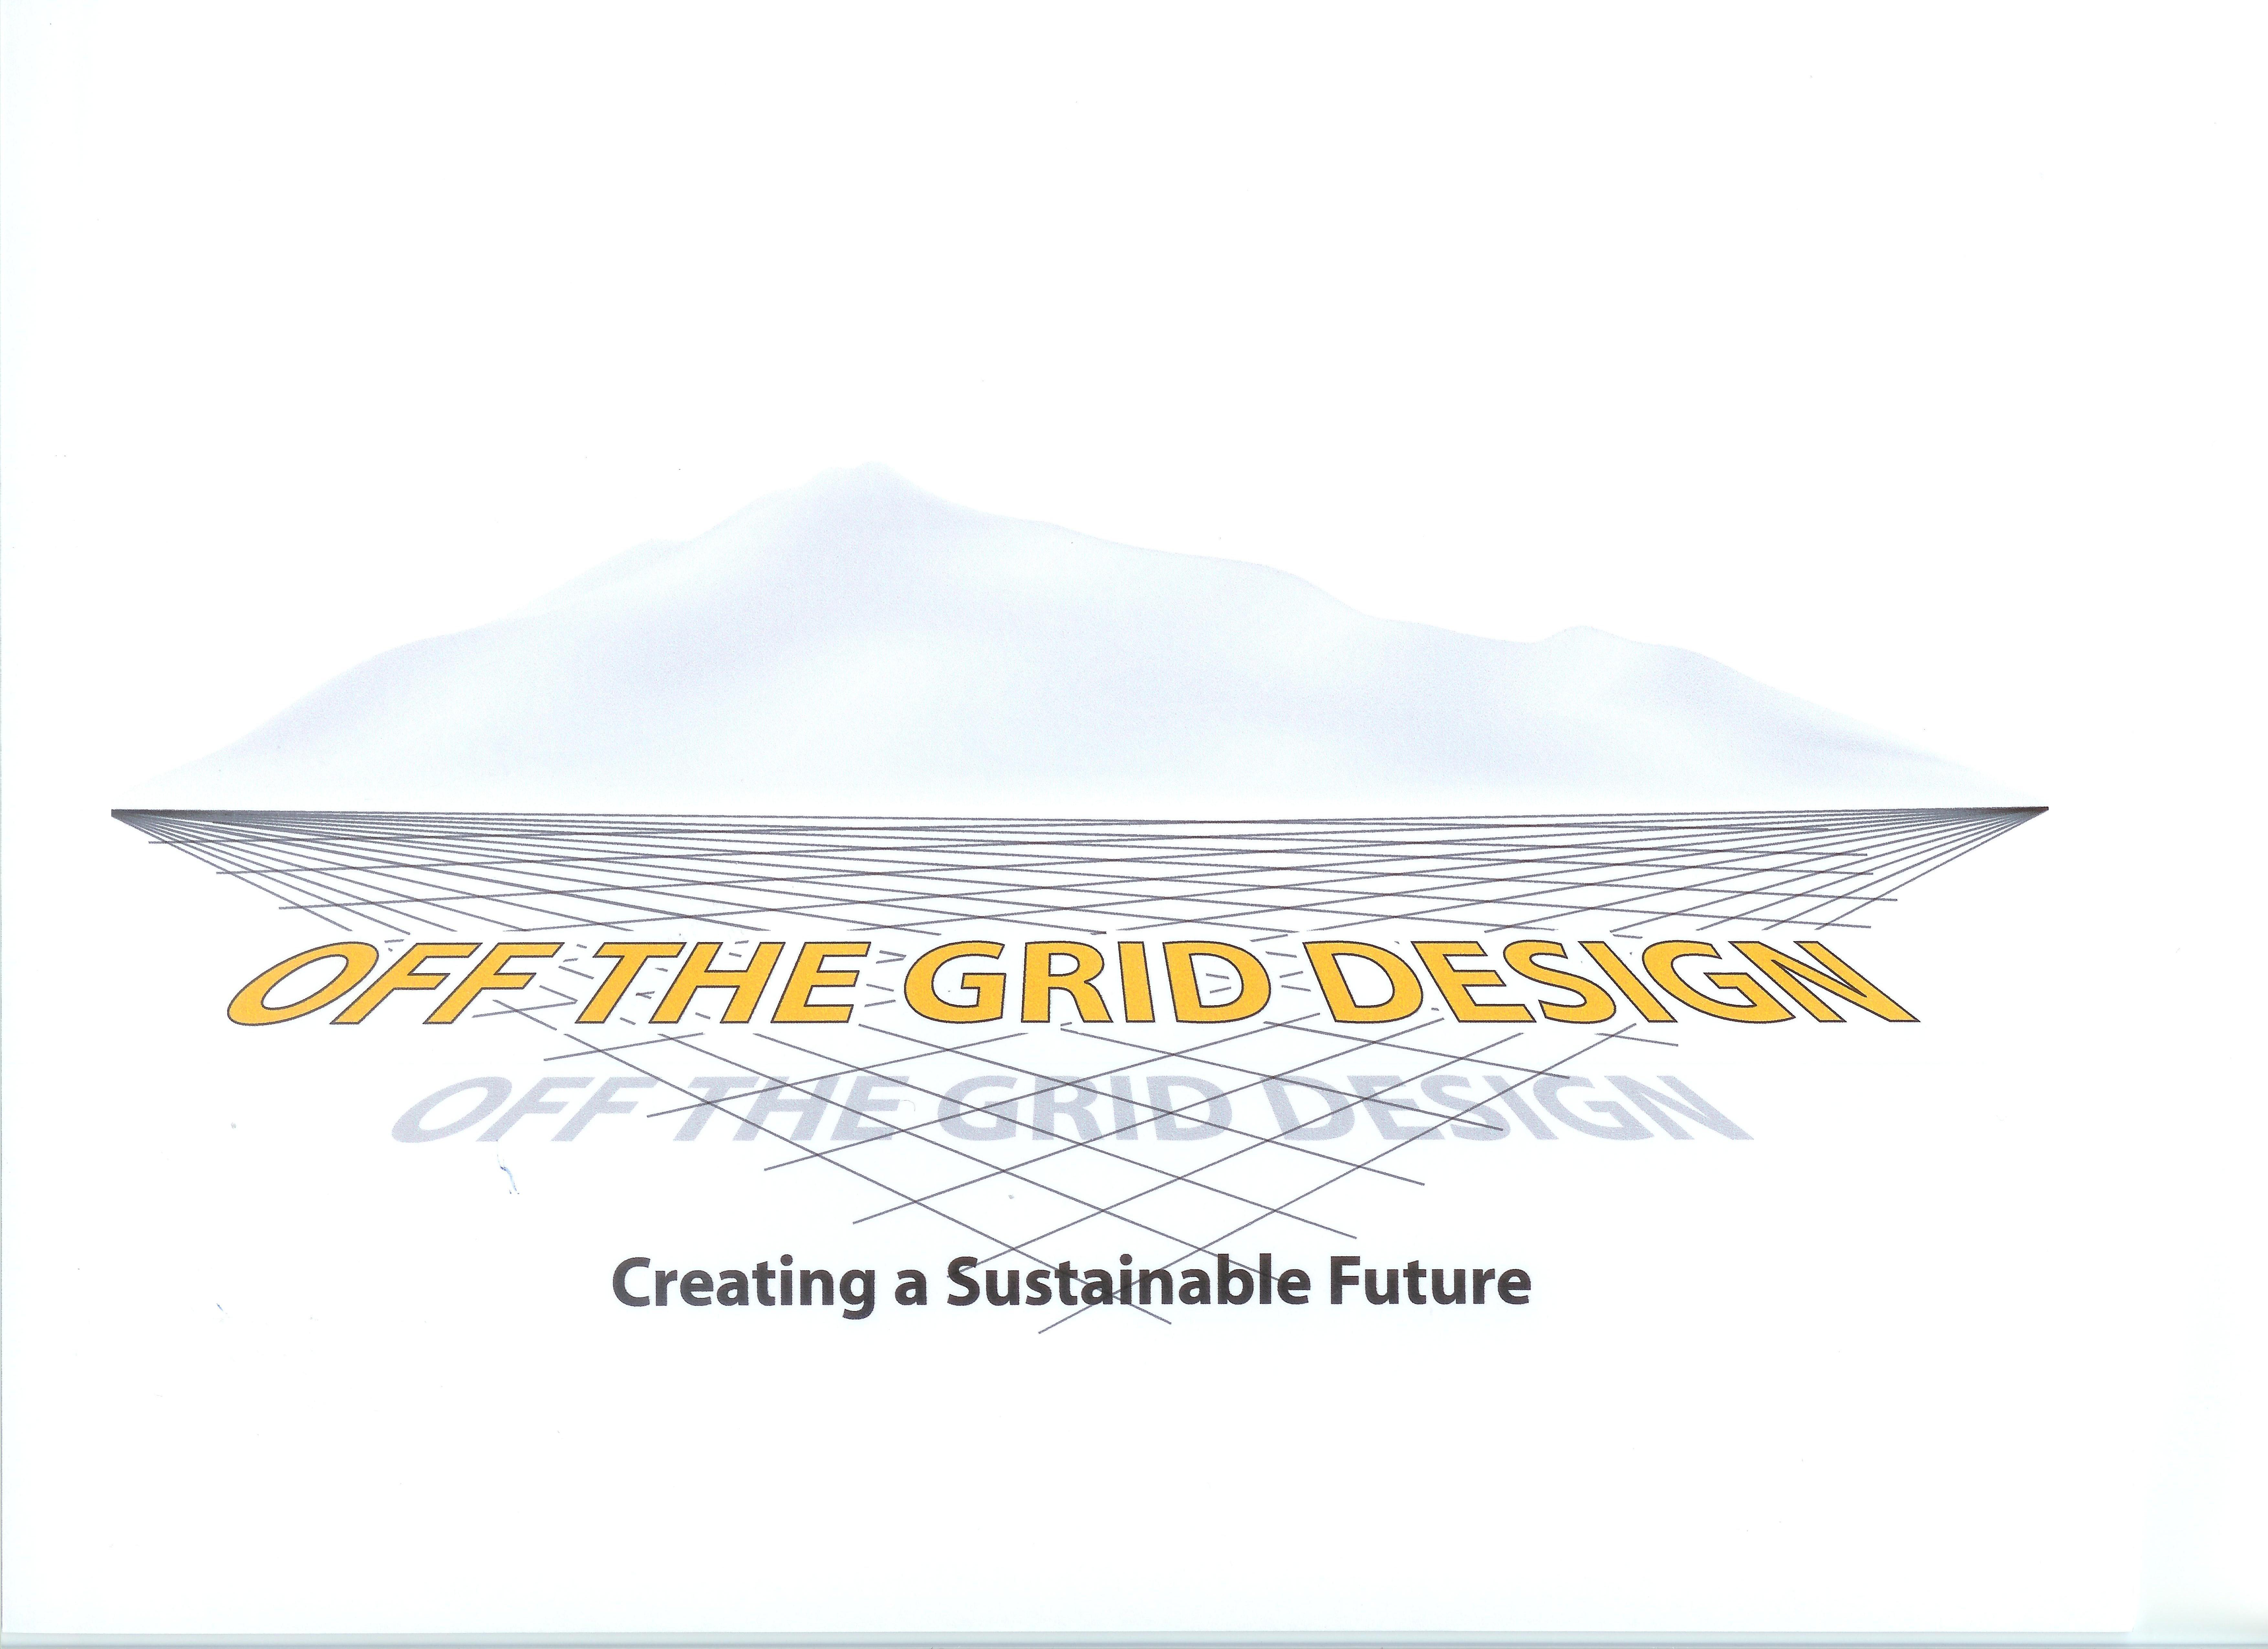 Off The Grid Design company logo